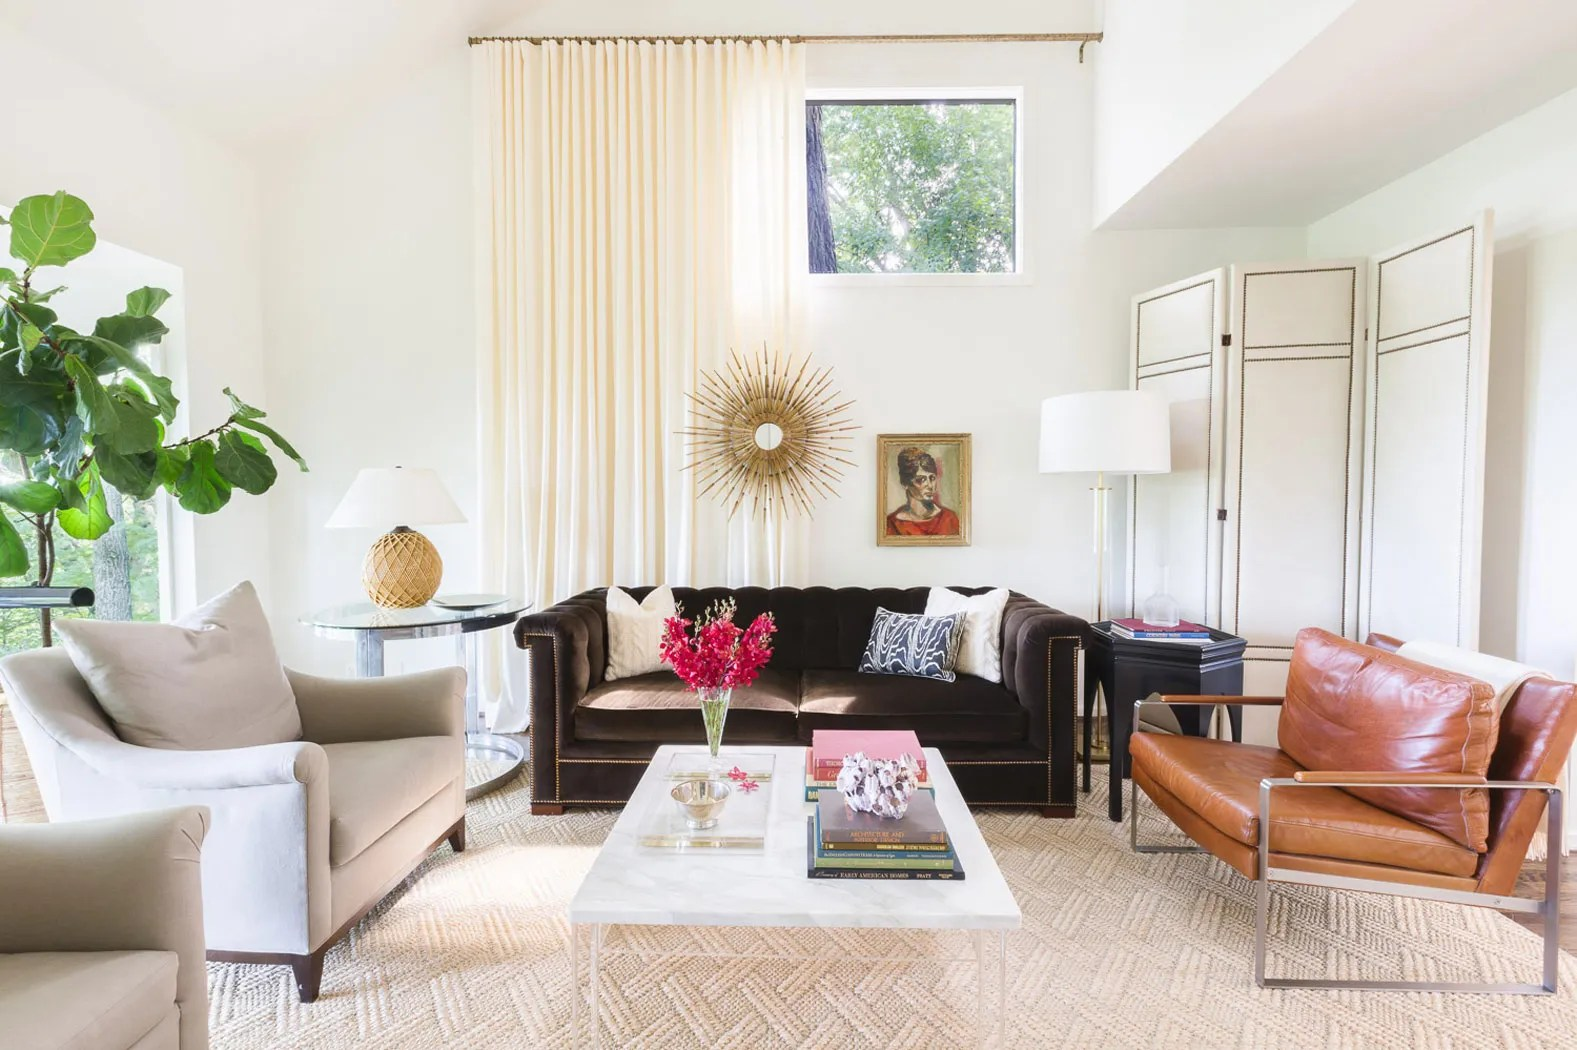 An Amazing Beforeandafter Living Room Renovation